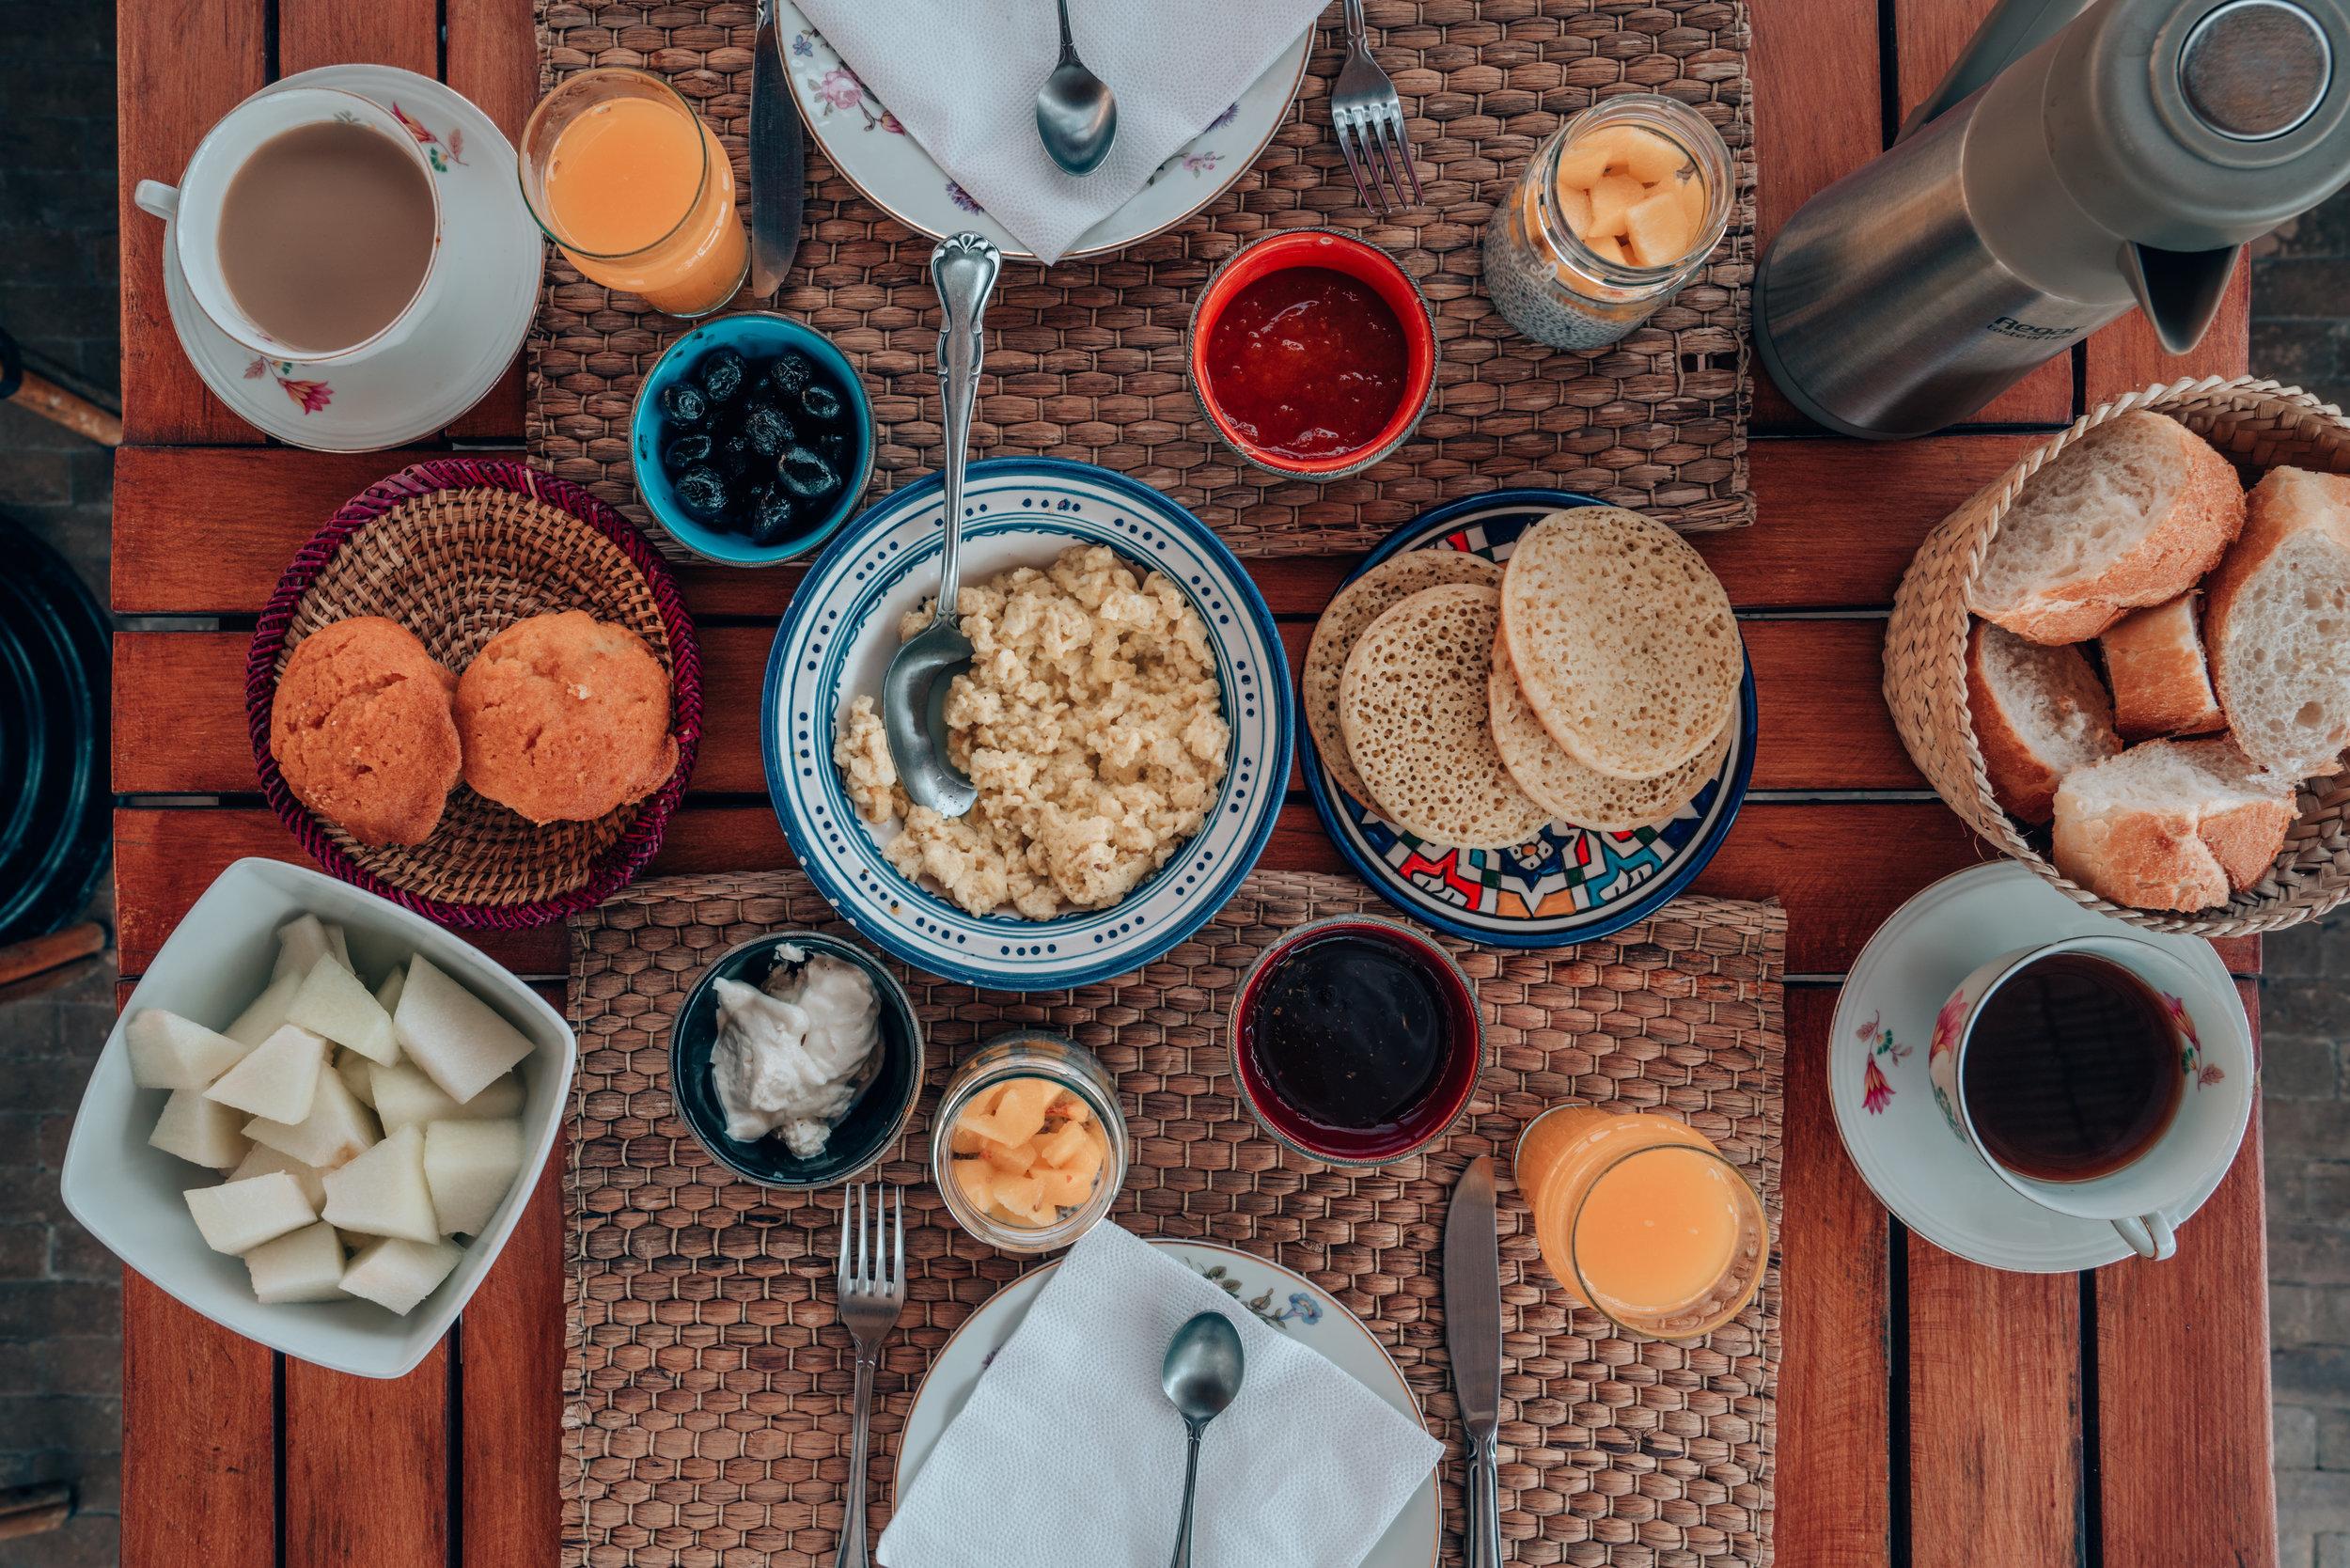 Riad Anata Breakfast Spread in Fes, Morocco